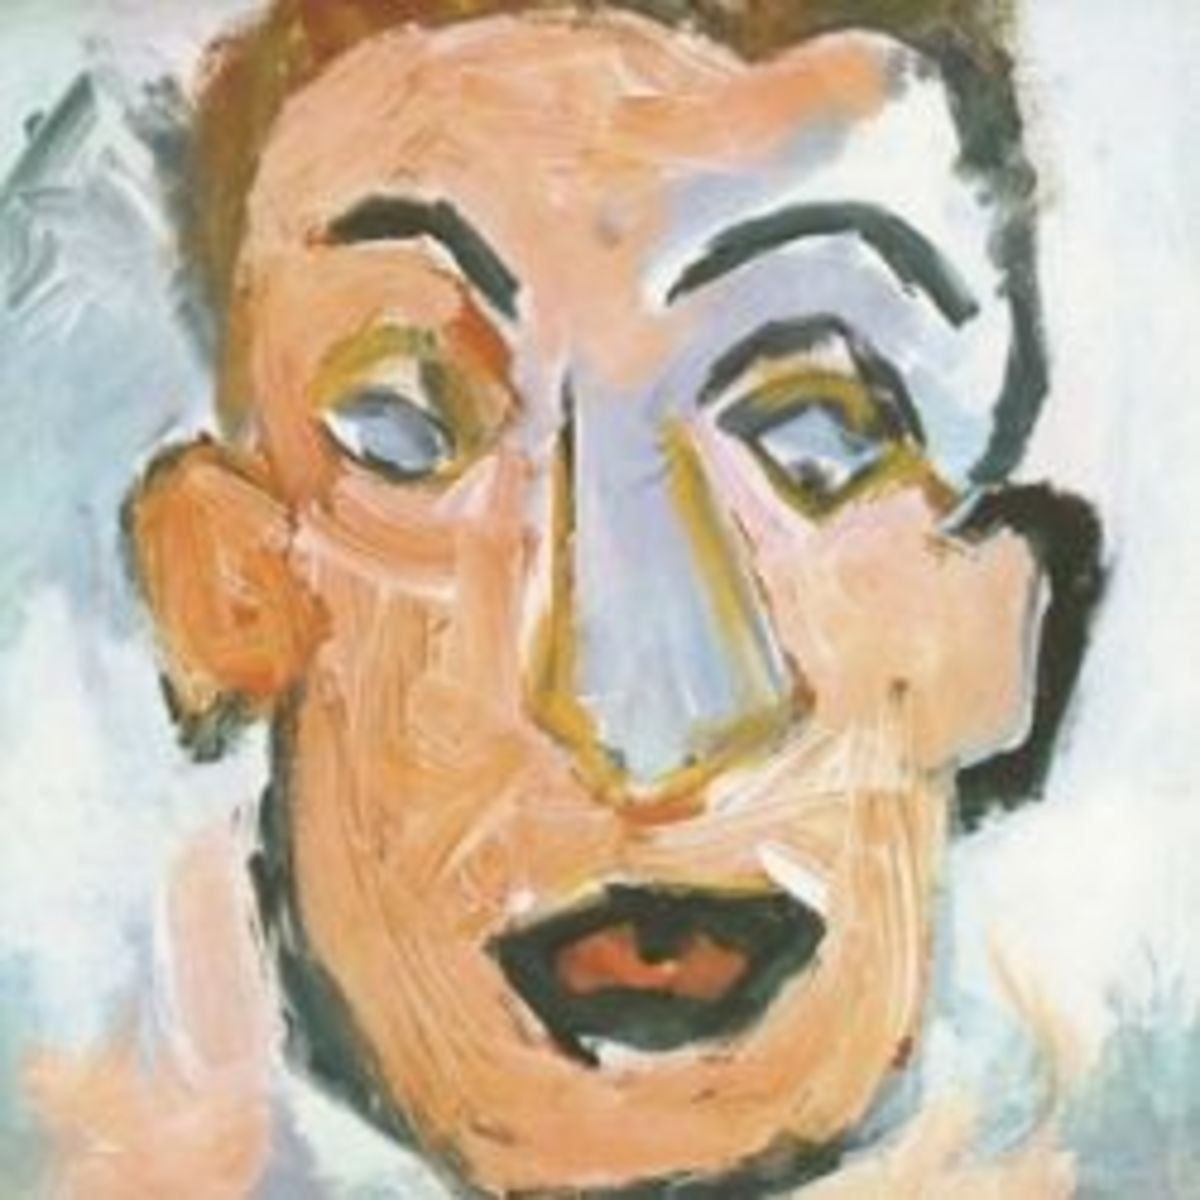 "Bob Dylan Columbia Records C2X 30050 12"" LP Vinyl Record (1970) Gatefold Album Cover Art by Bob Dylan"